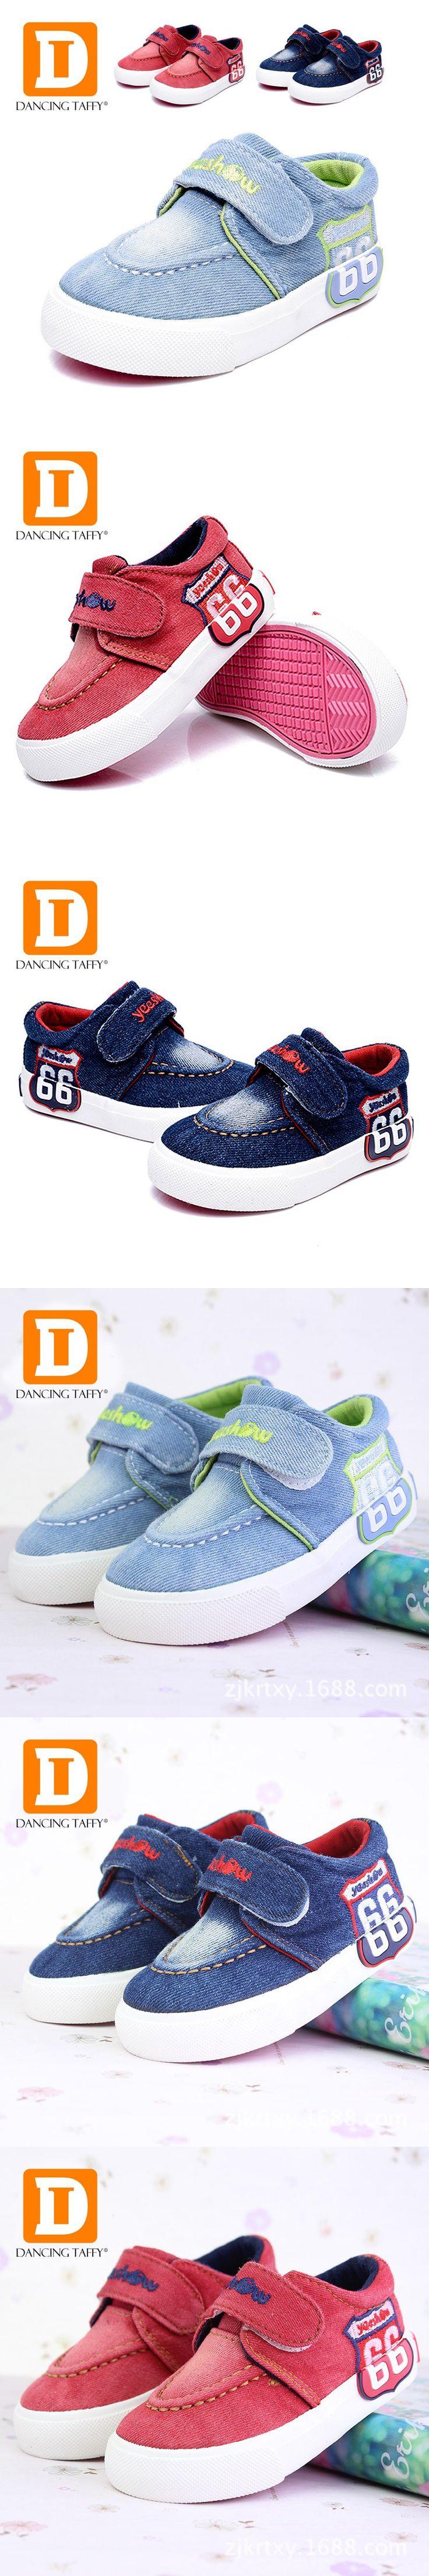 Solid Canvas Fashion Kids Shoes New 2016 Brand Board Girls Boys Sneakers Denim Baby Footwear Rubber Hook Loop Children Shoes